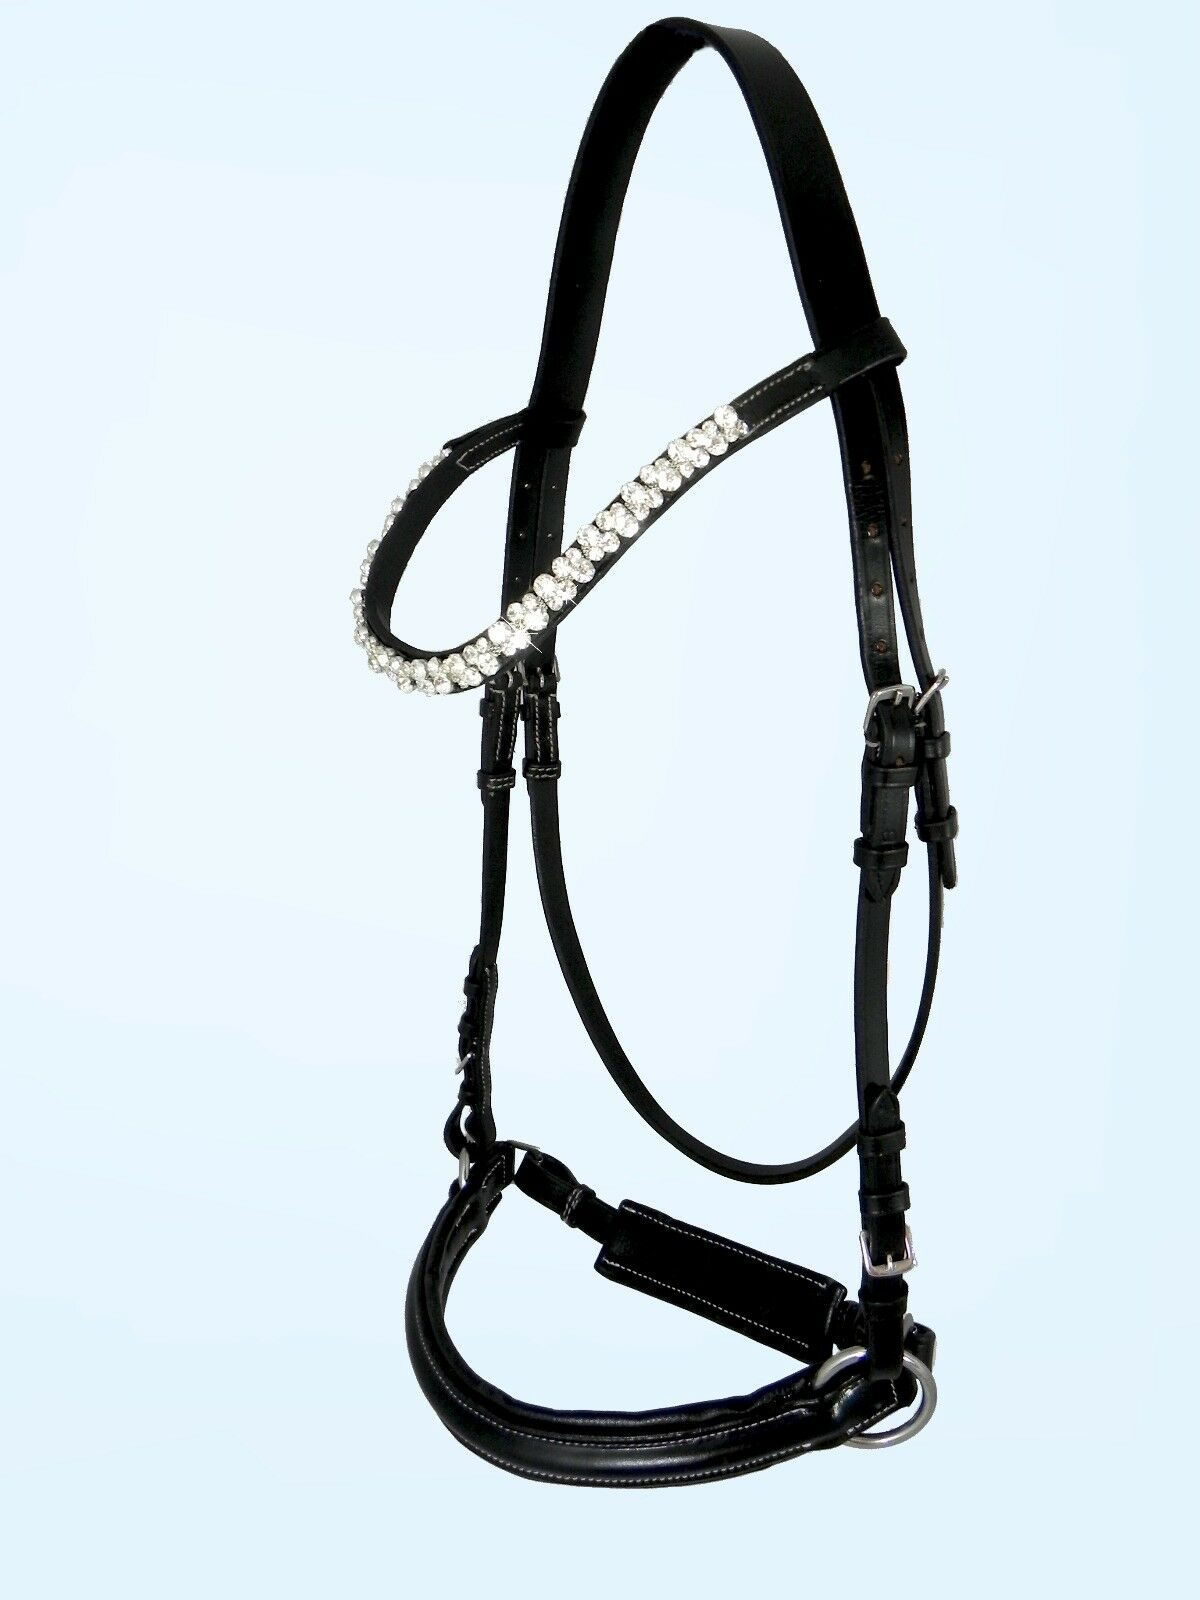 Gebissloser logran contener grande Royal Bitless Bridle sidepull con brillo Pony, VB, WB